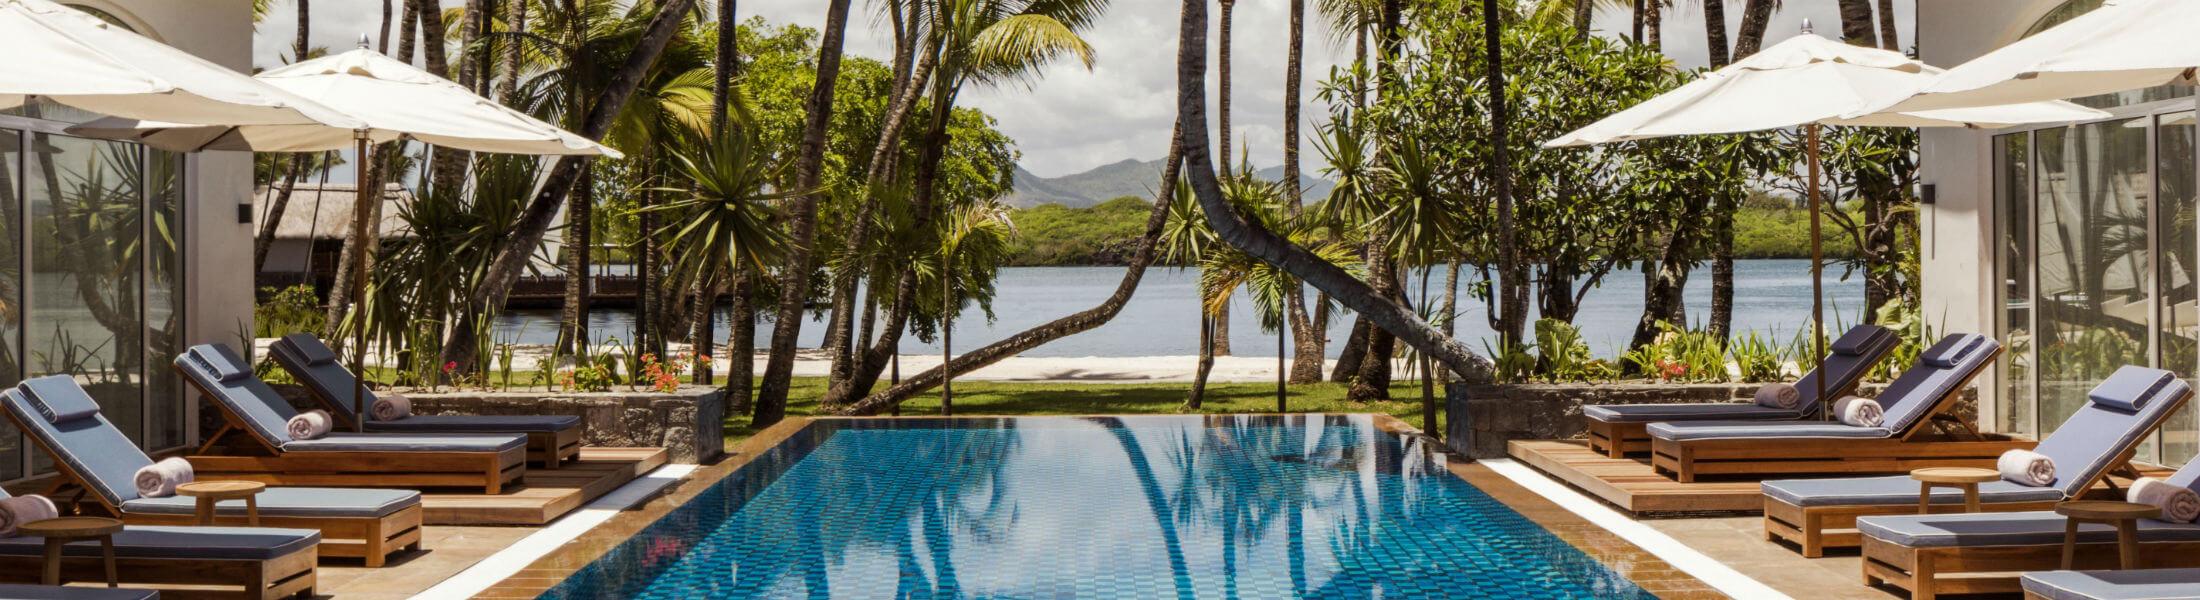 One&Only Le Saint Geran, Mauritius - Pool